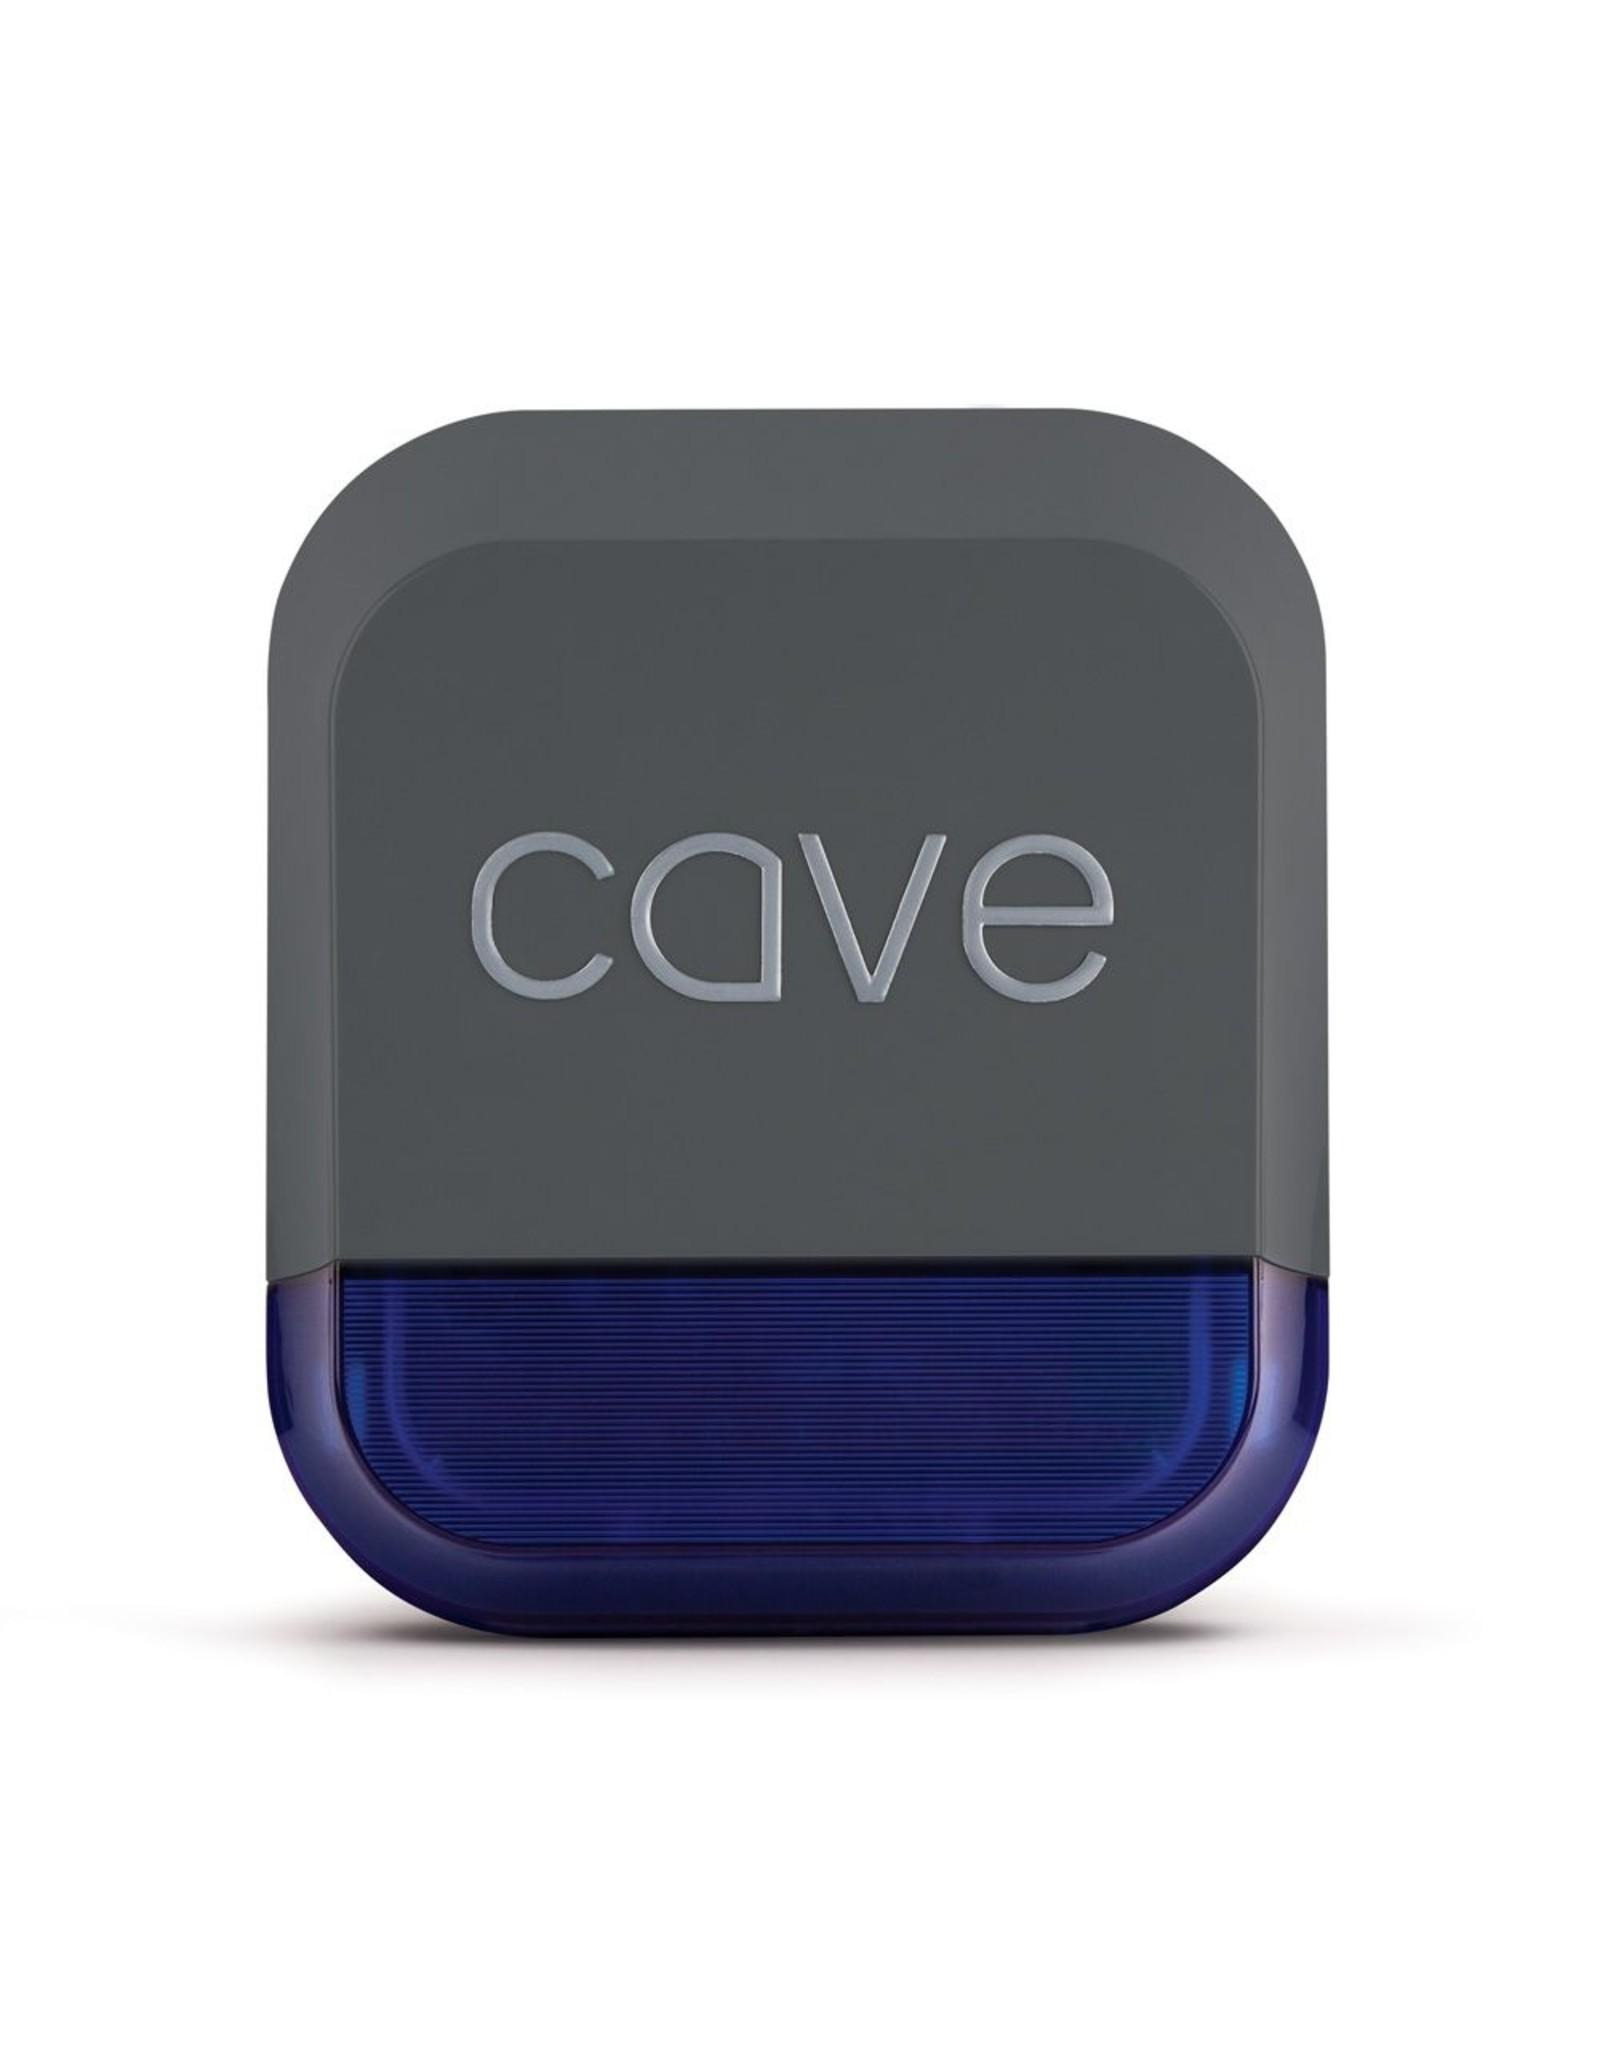 Veho Veho Cave Wireless Outdoor Siren